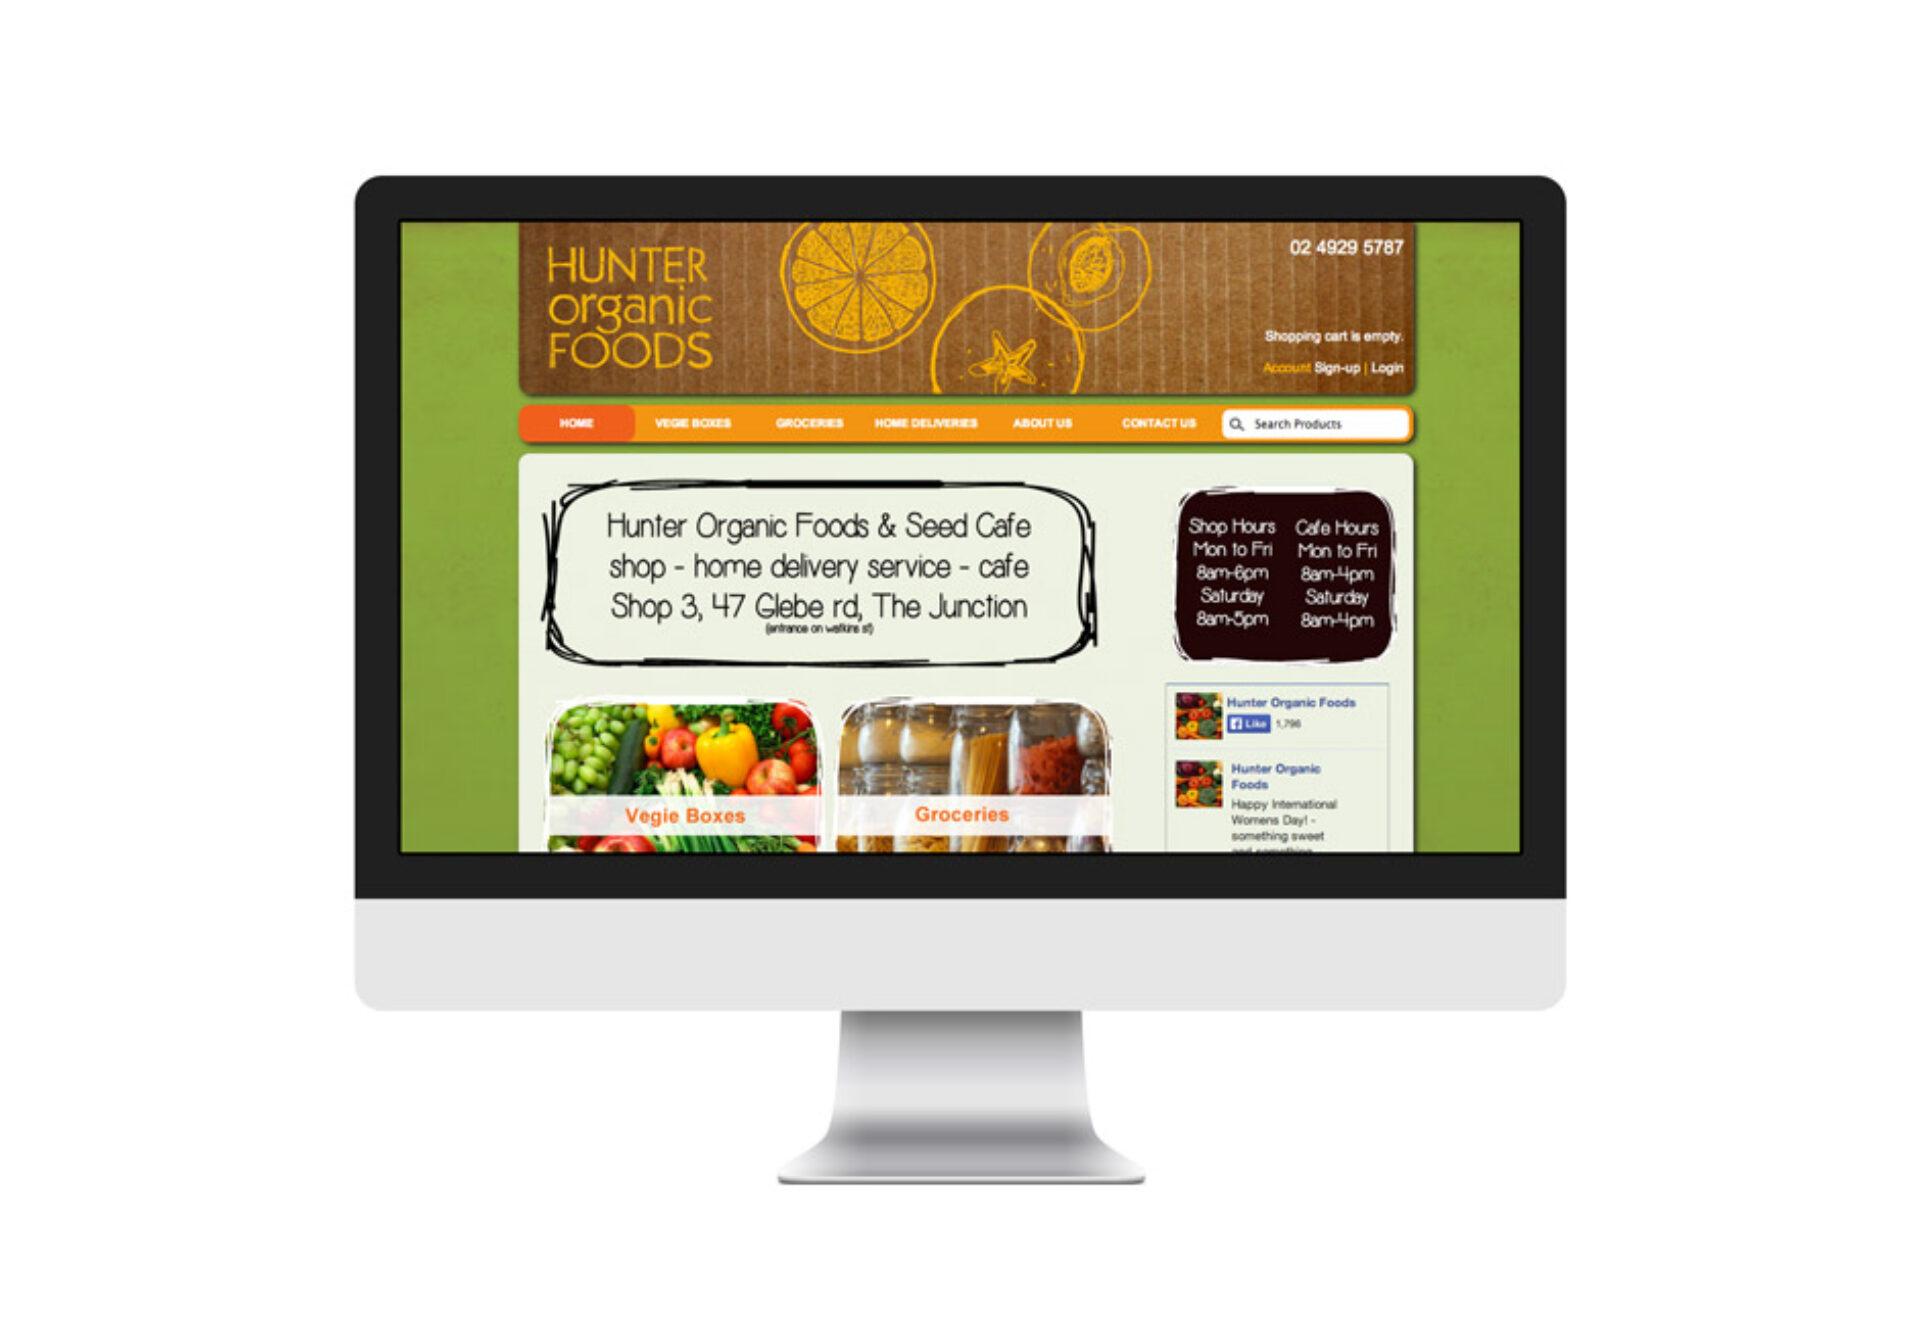 Hunter organic foods 02